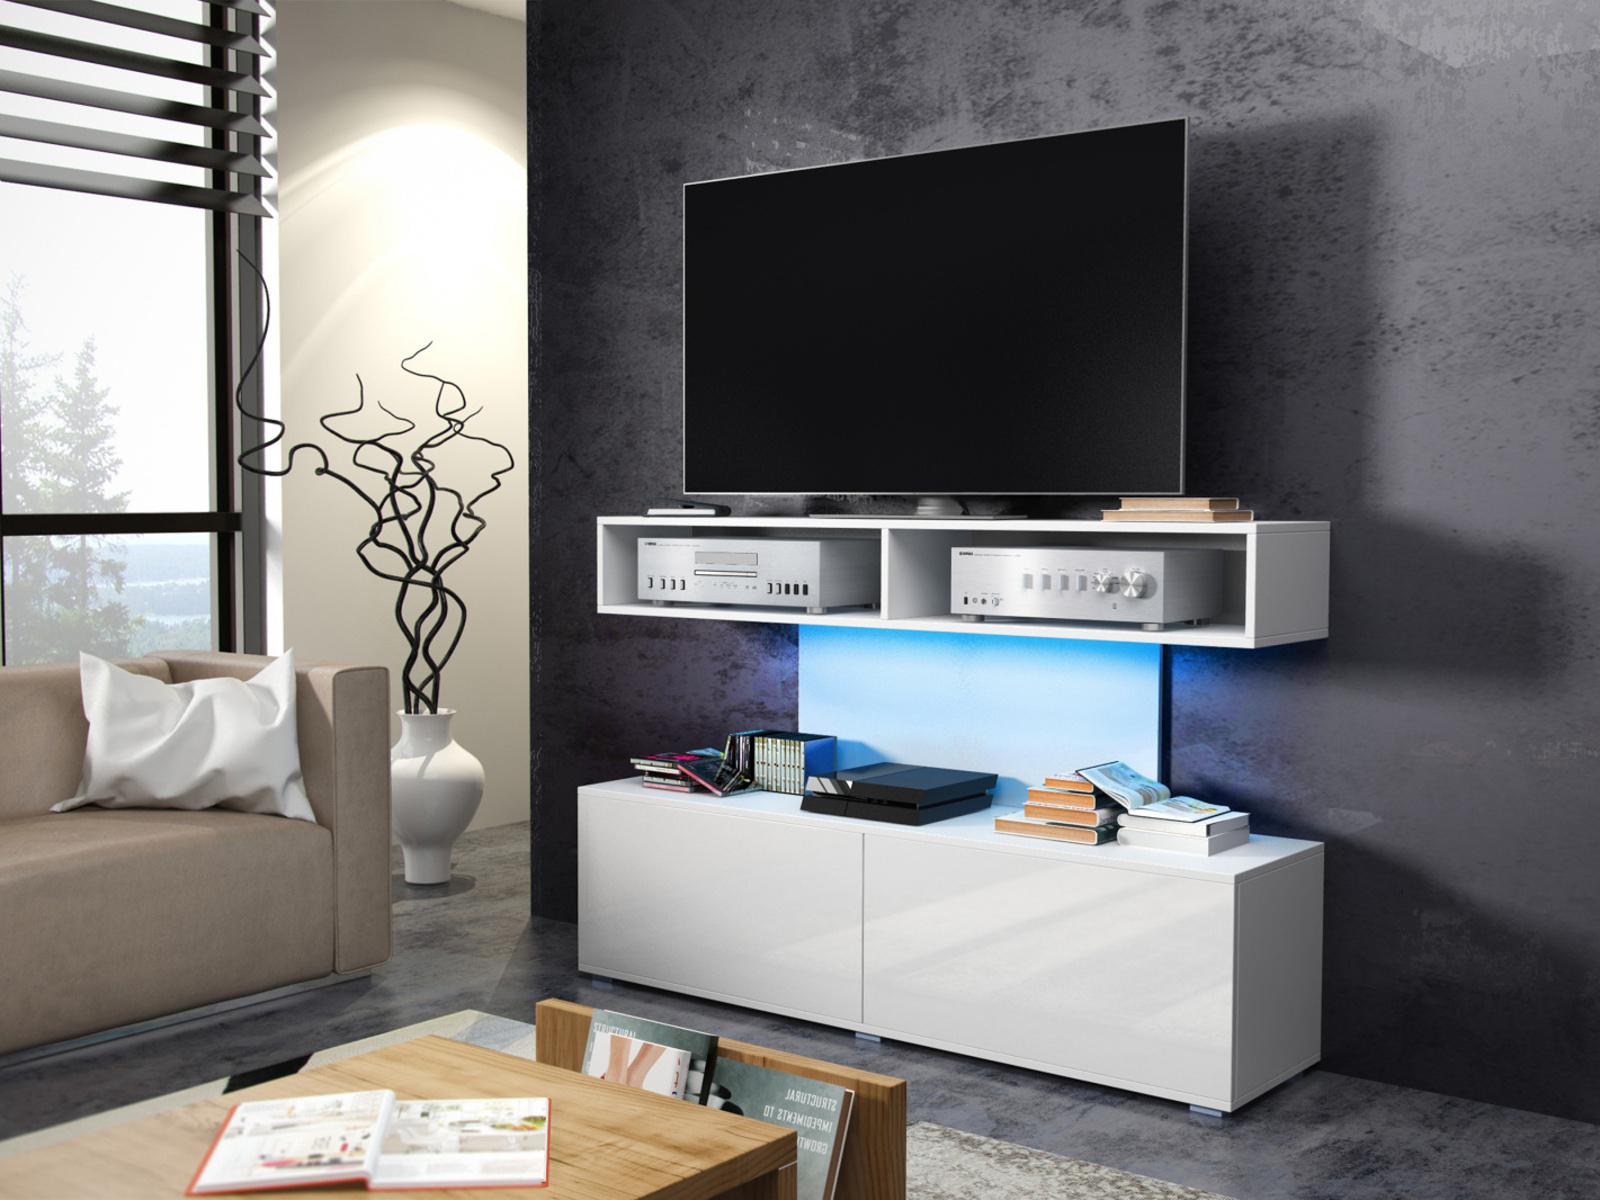 MORAVIA FLAT REX televizní stolek, bílá/bílý lesk